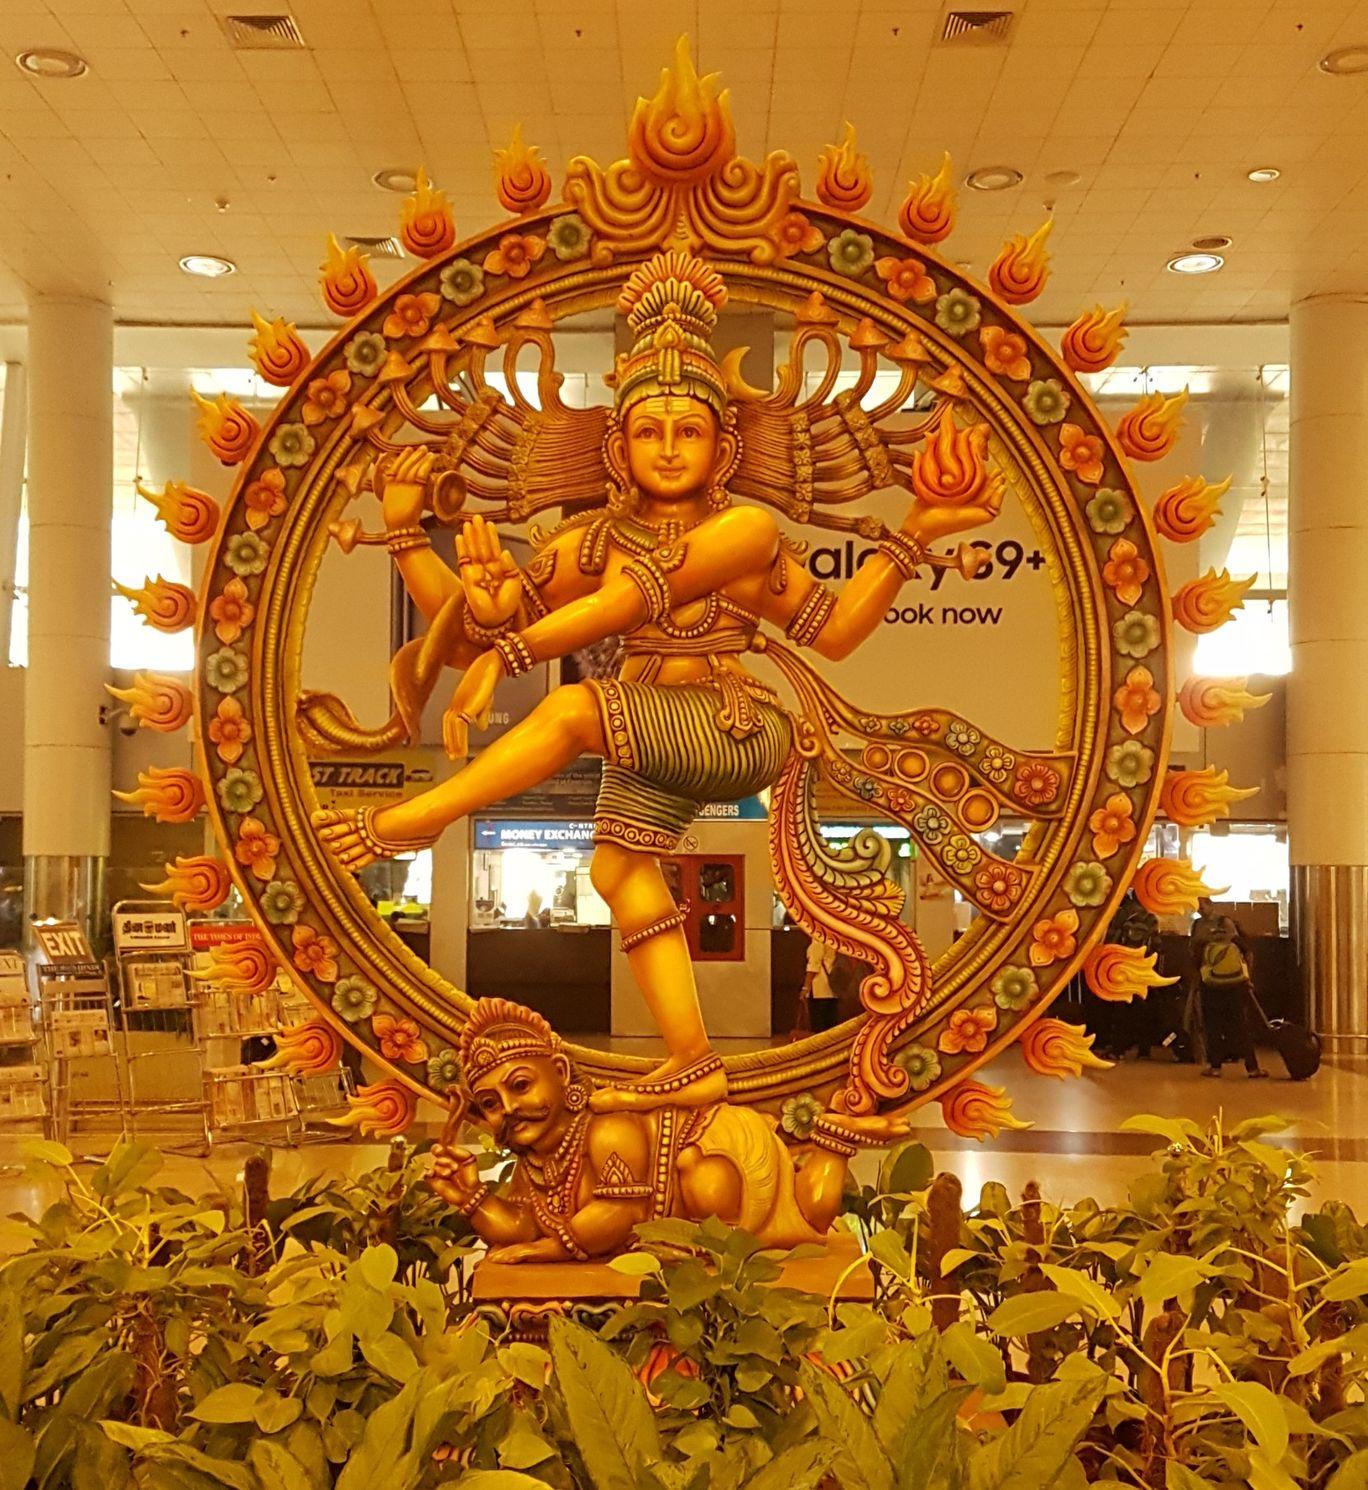 Photo of Chennai International Airport (MAA) By Arjun Manigandan